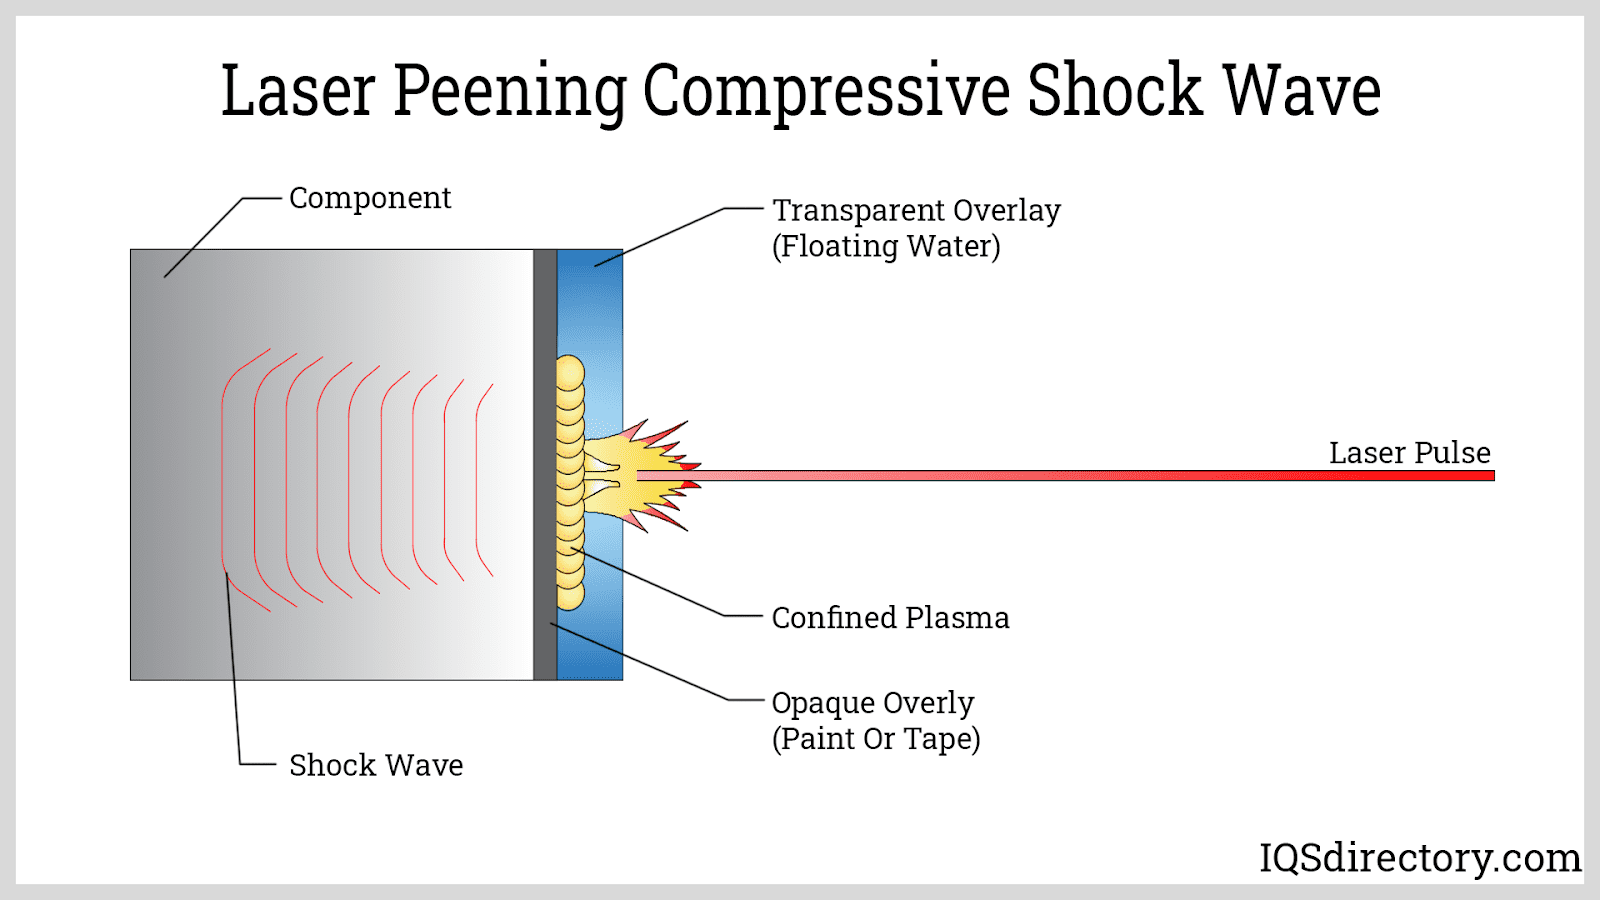 Laser Peening Compressive Shock Wave